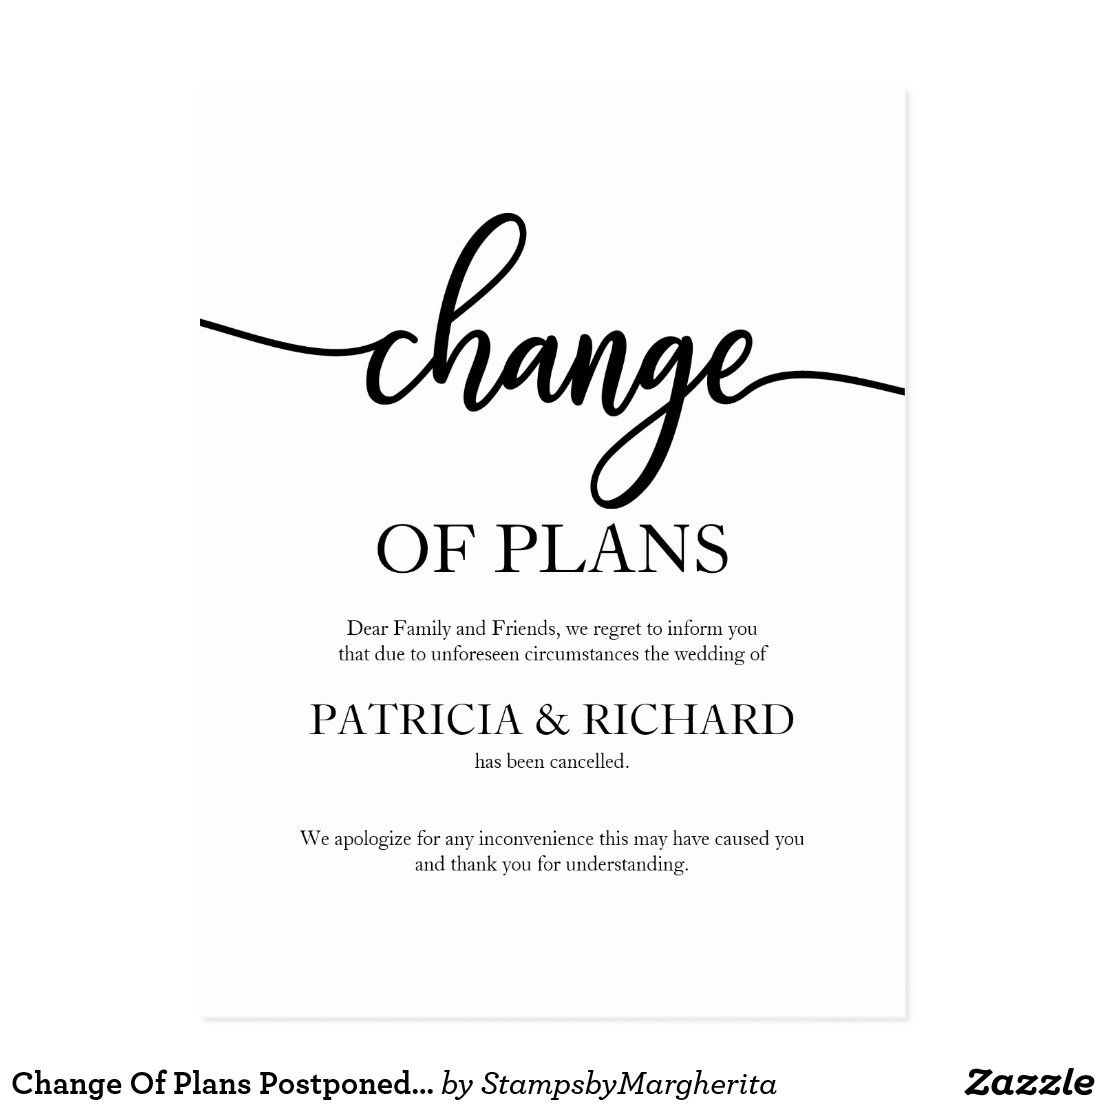 Change of plans postponed cancelled wedding postcard